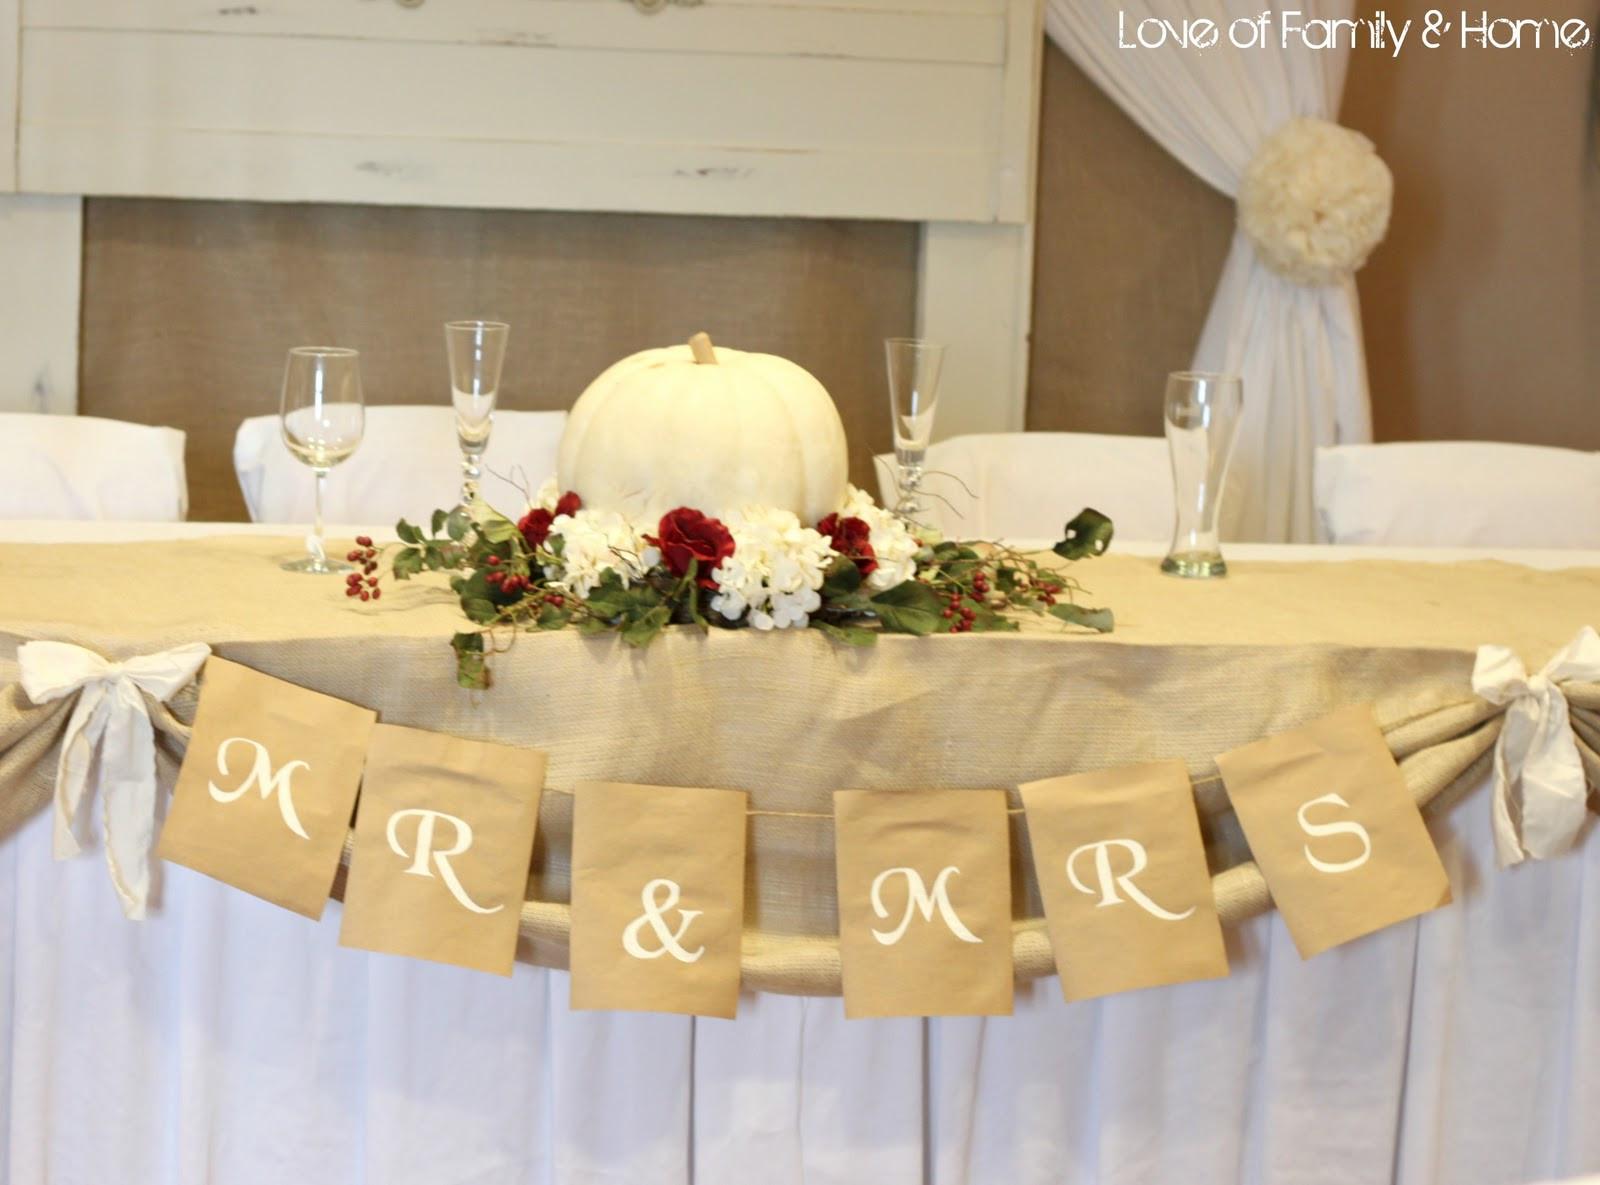 DIY Wedding Reception Decorations  DIY Rustic Chic Fall Wedding Reveal Love of Family